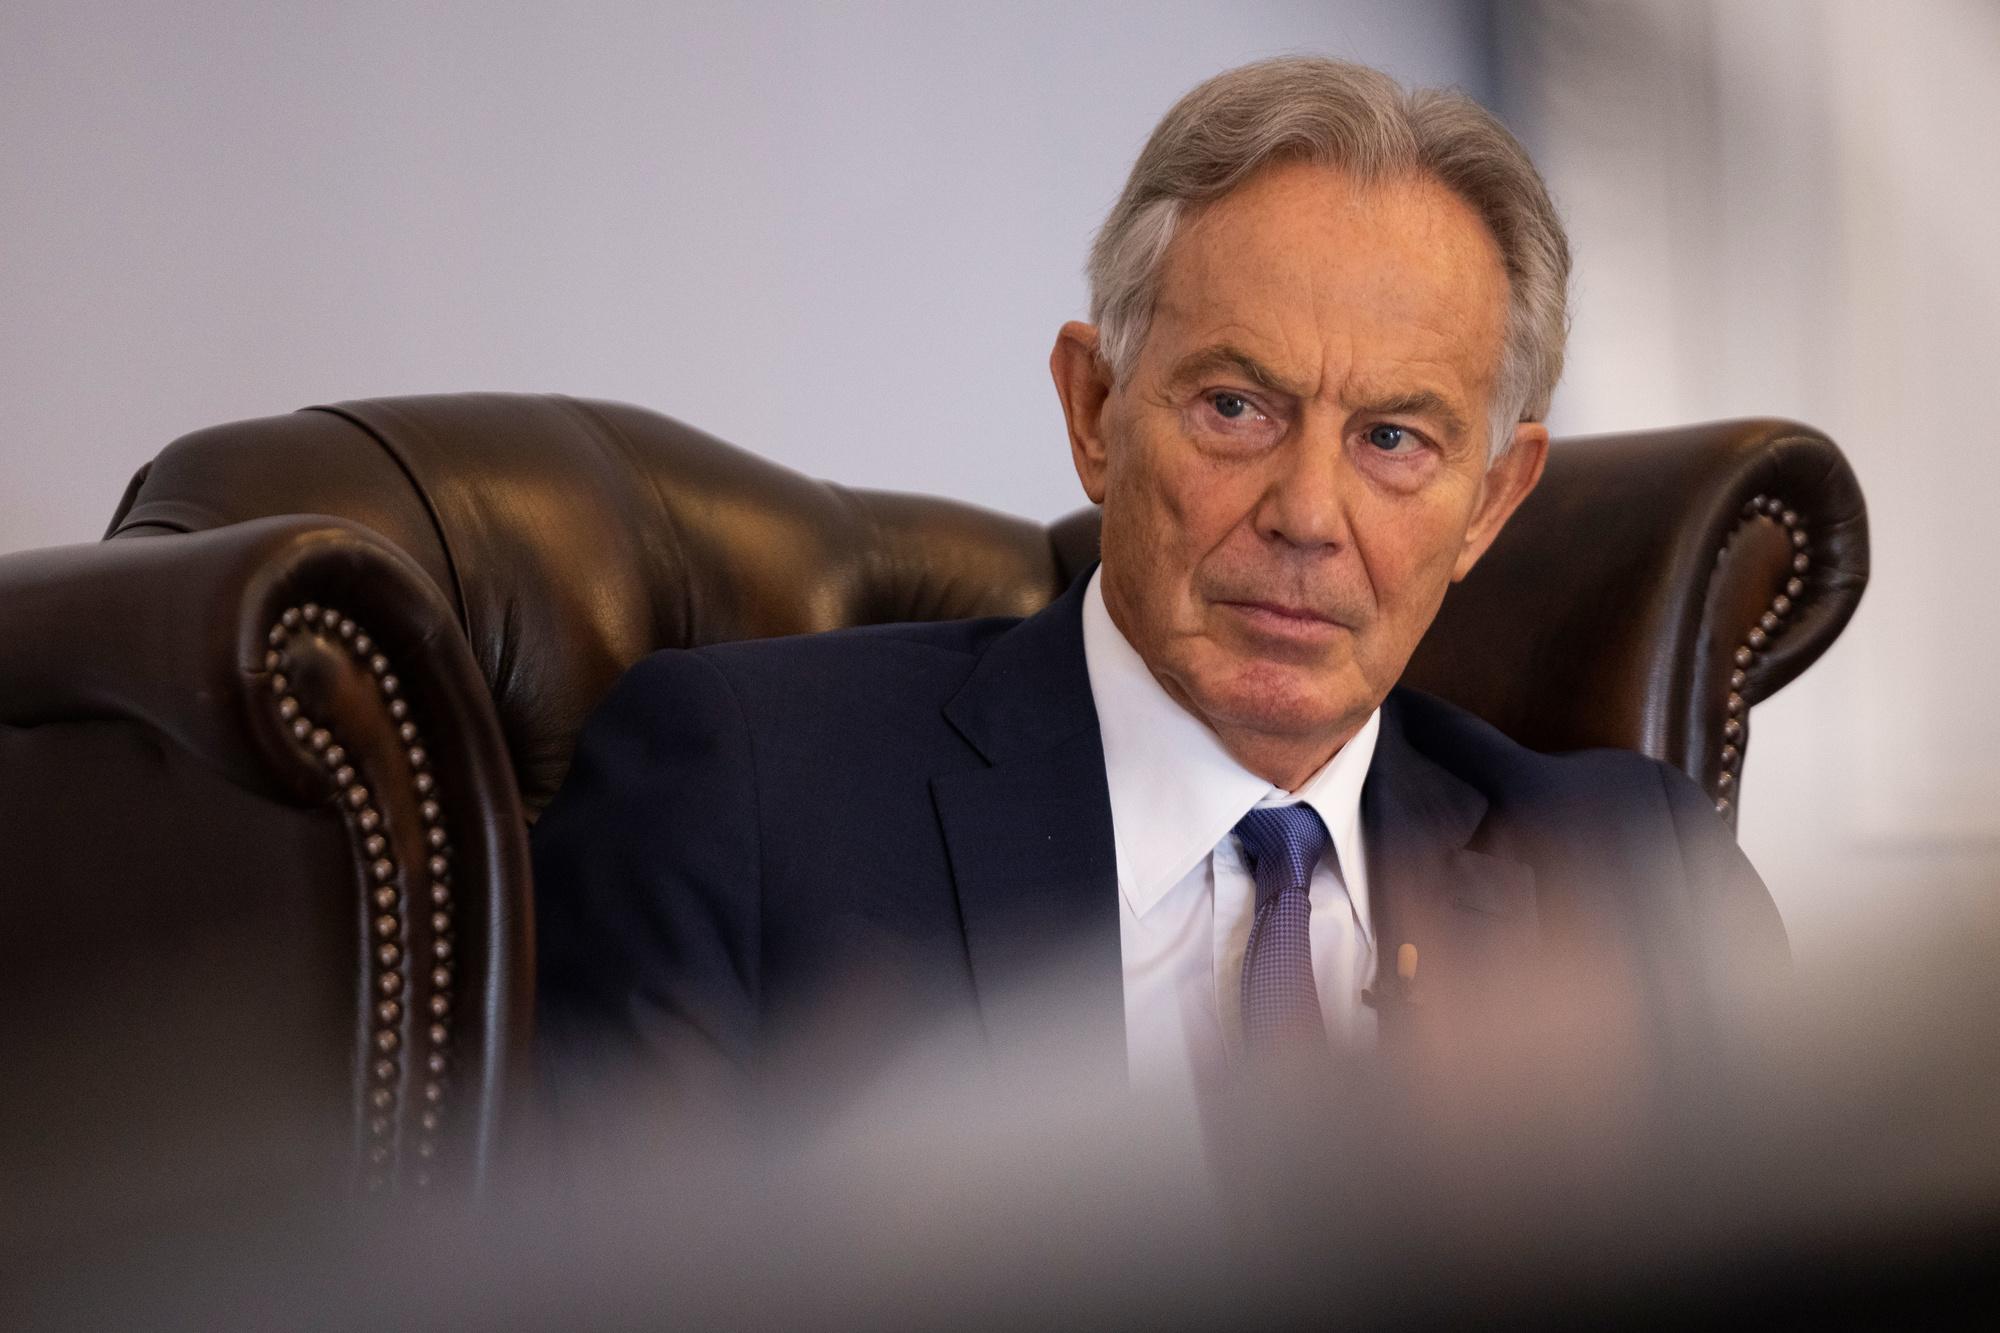 Voormalig Brits premier Tony Blair., iStock